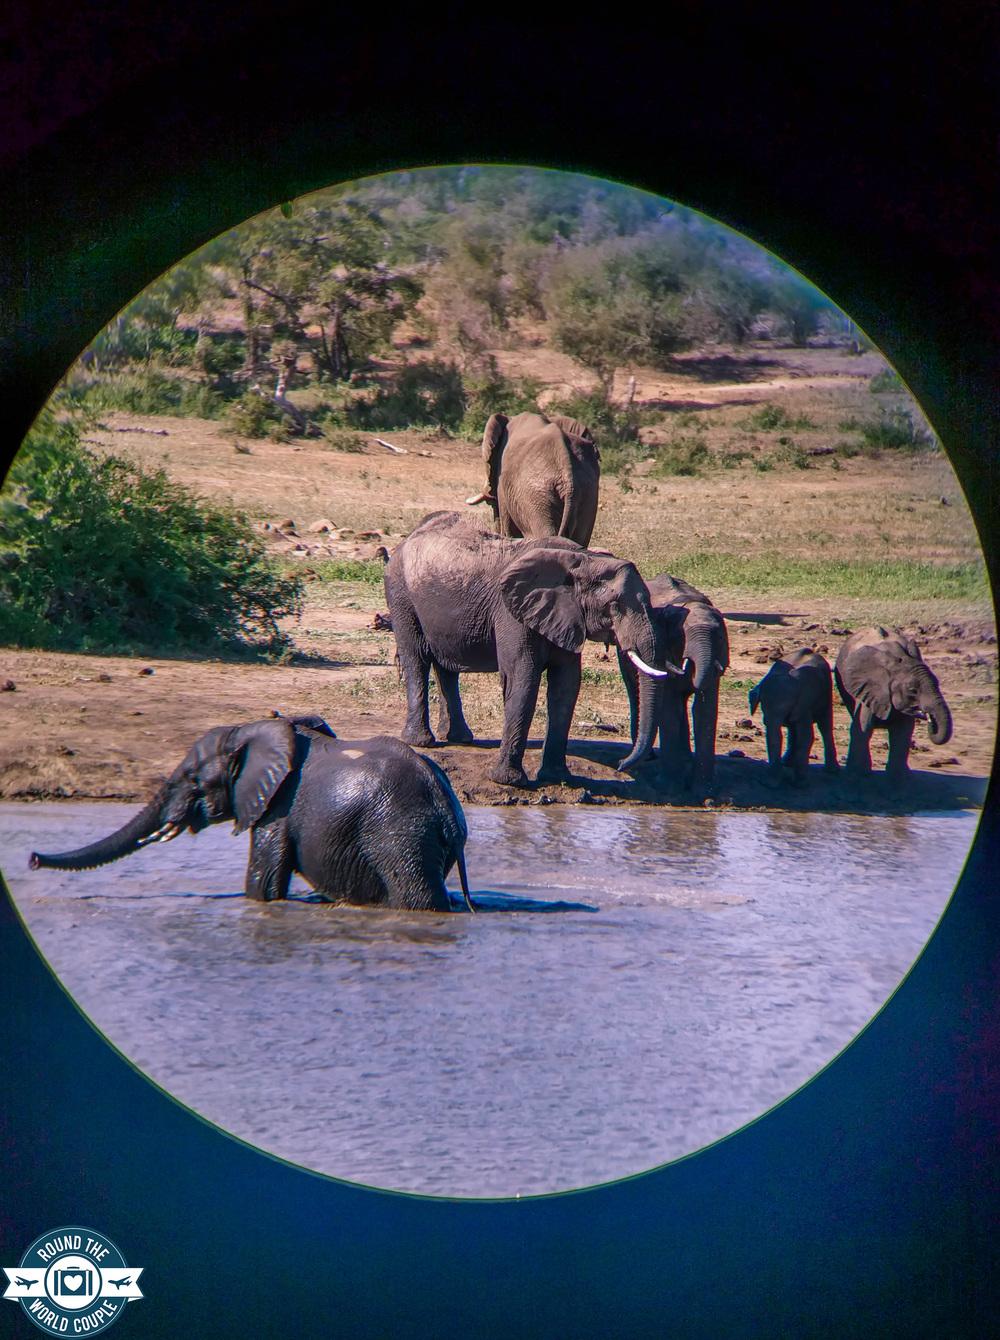 Kruger elephant watering hole 1 (1 of 1).jpg